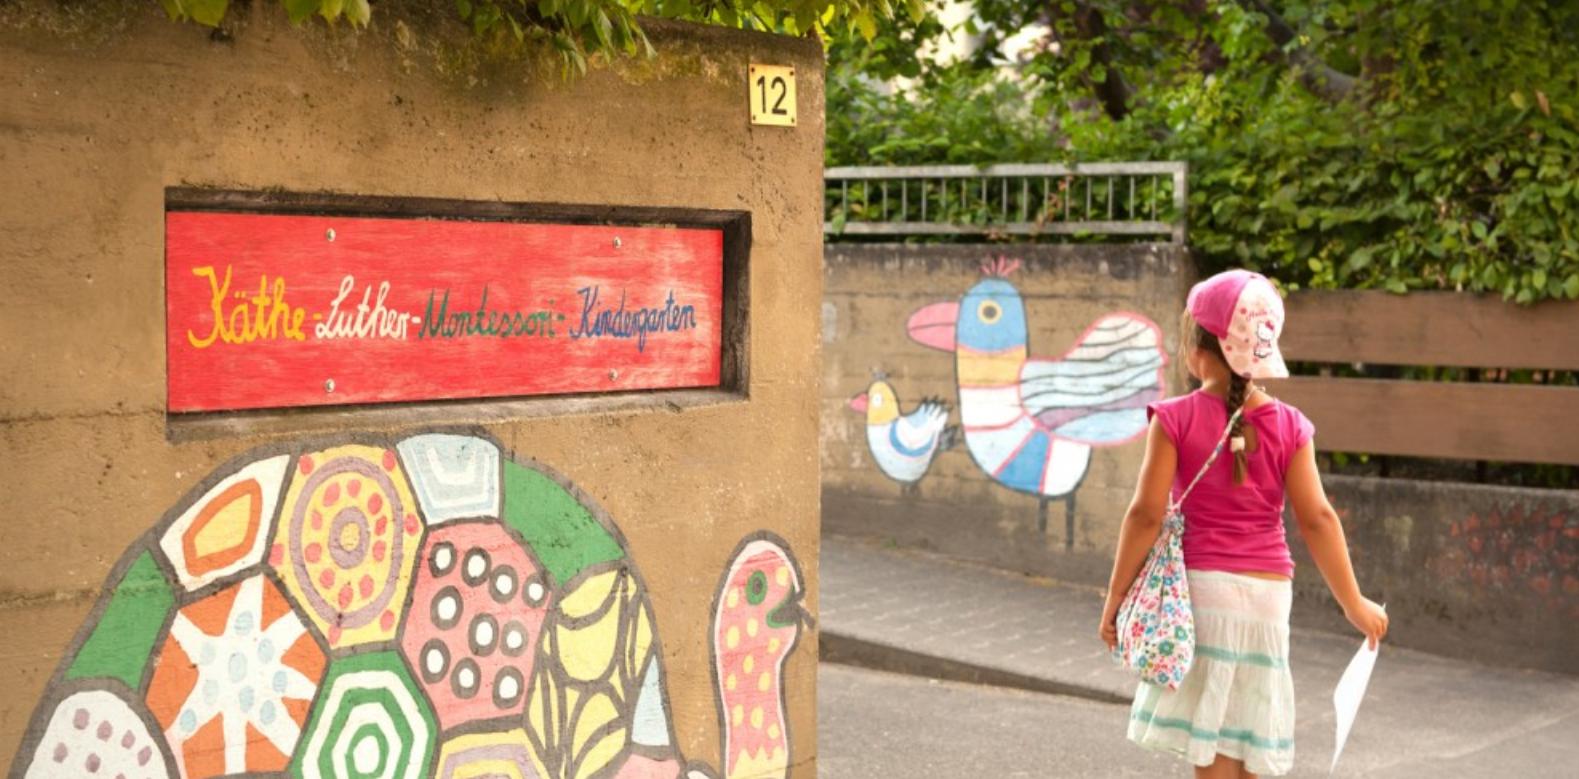 K the Luther Montessori Kindergarten